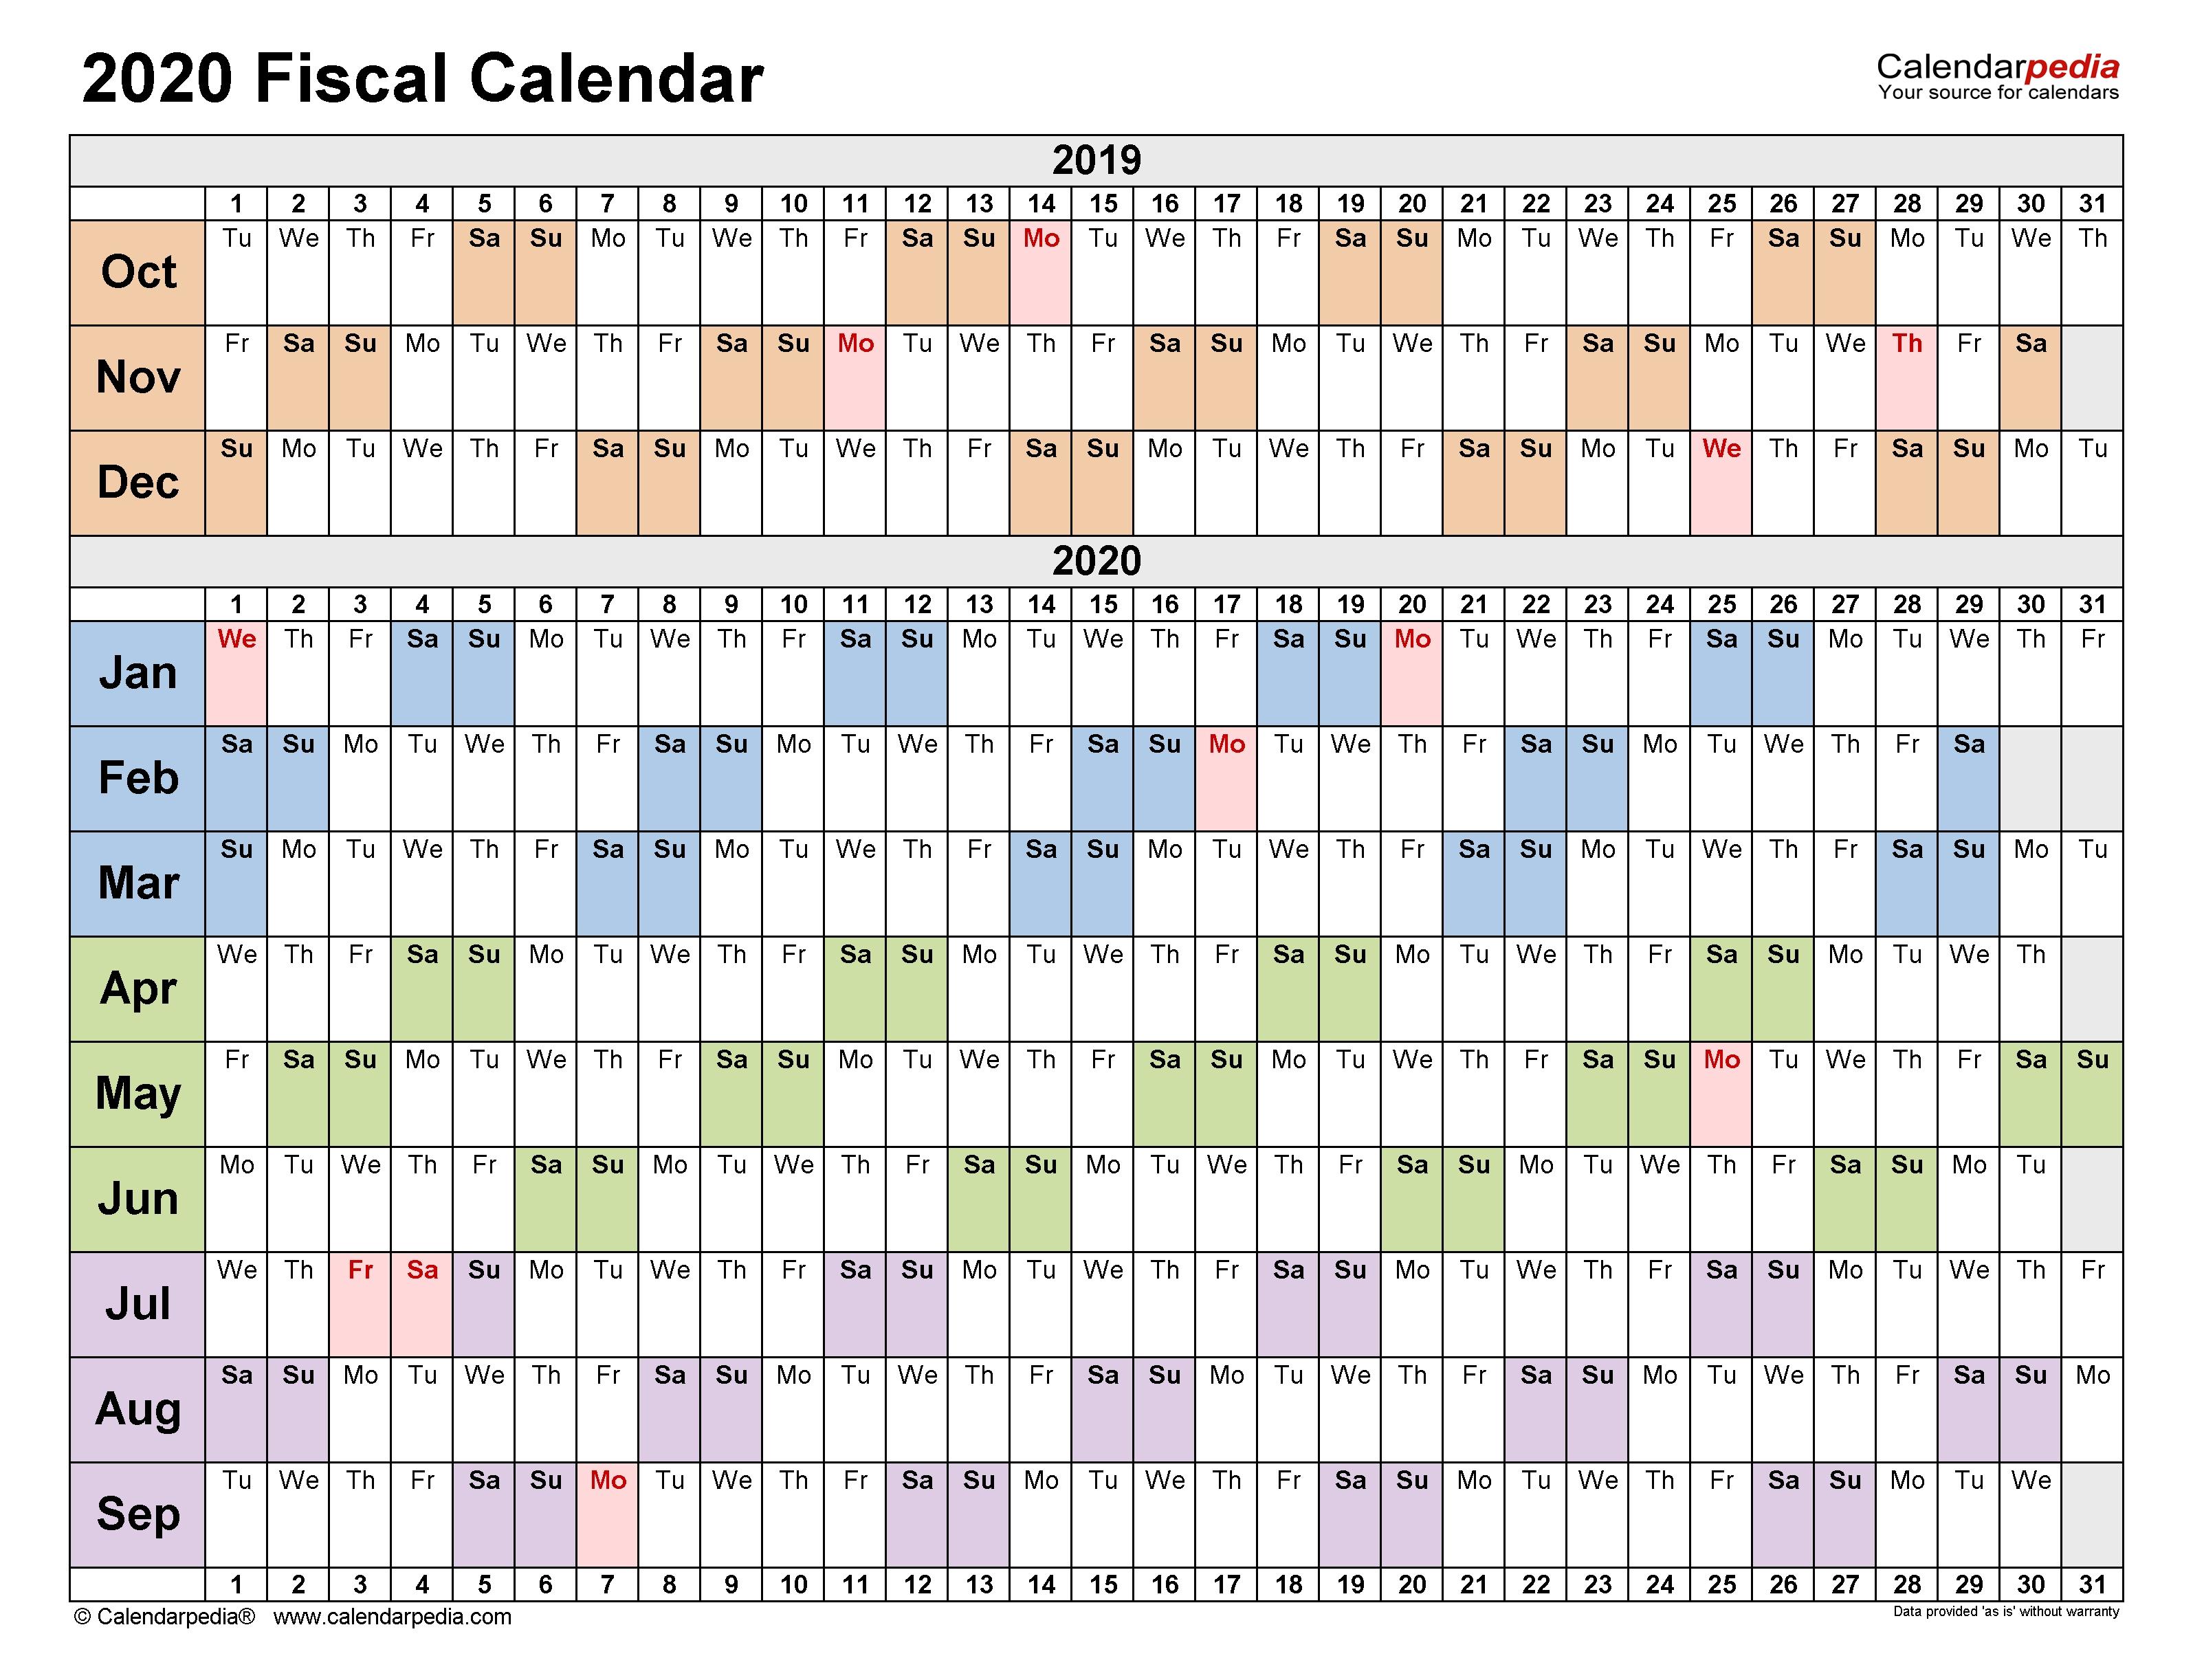 Fiscal Calendars 2020 - Free Printable Pdf Templates pertaining to 2020 Fiscal Calendar 4 4 5